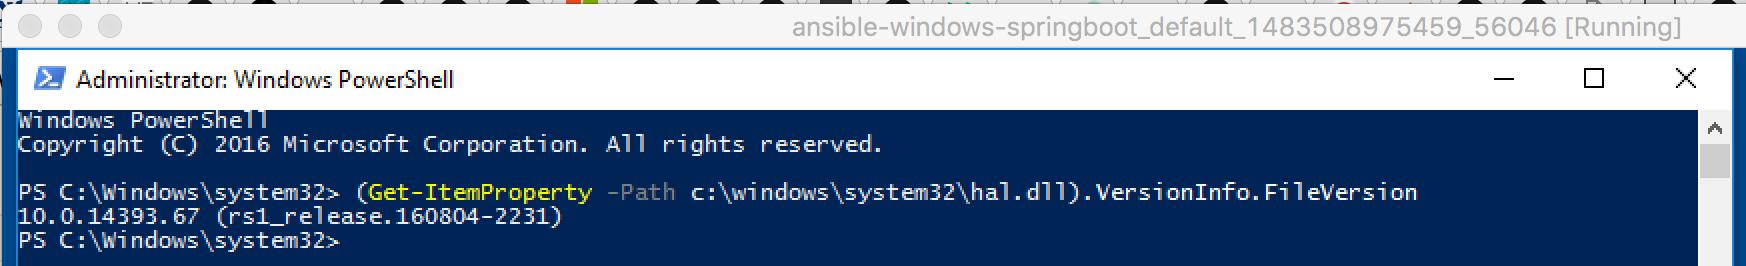 Windows_build_number_Docker_failing